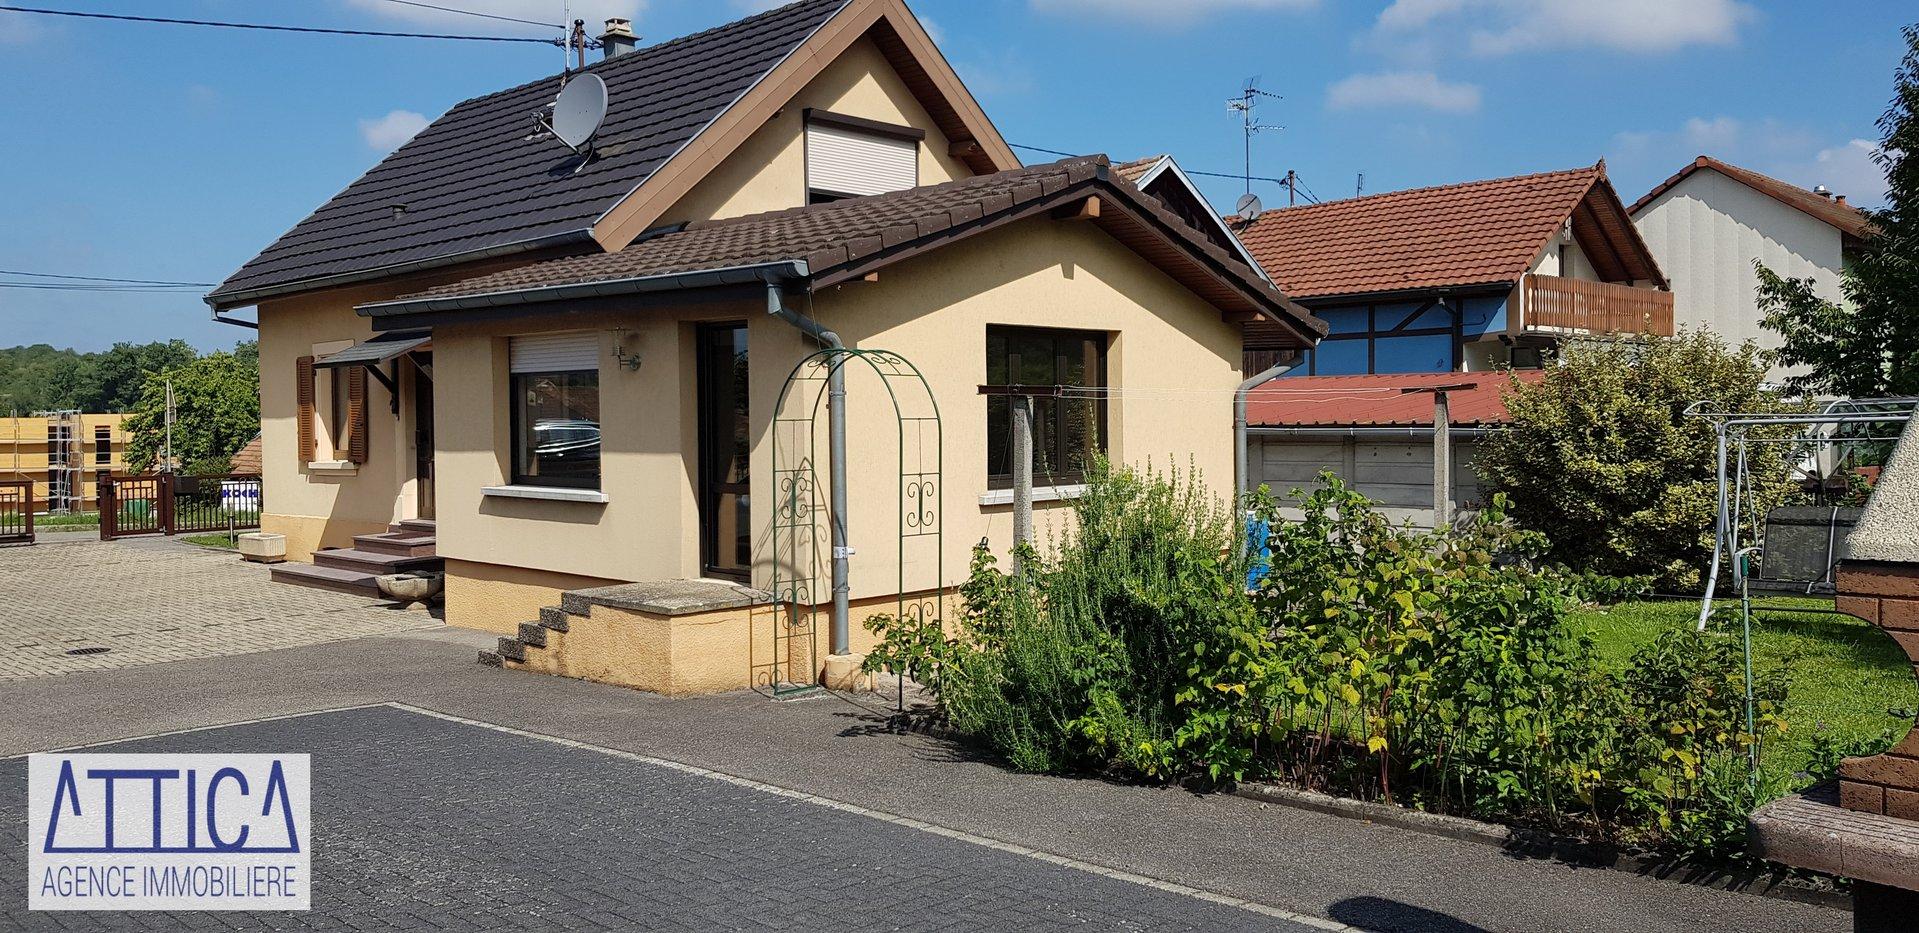 Vente Maison - Illfurth